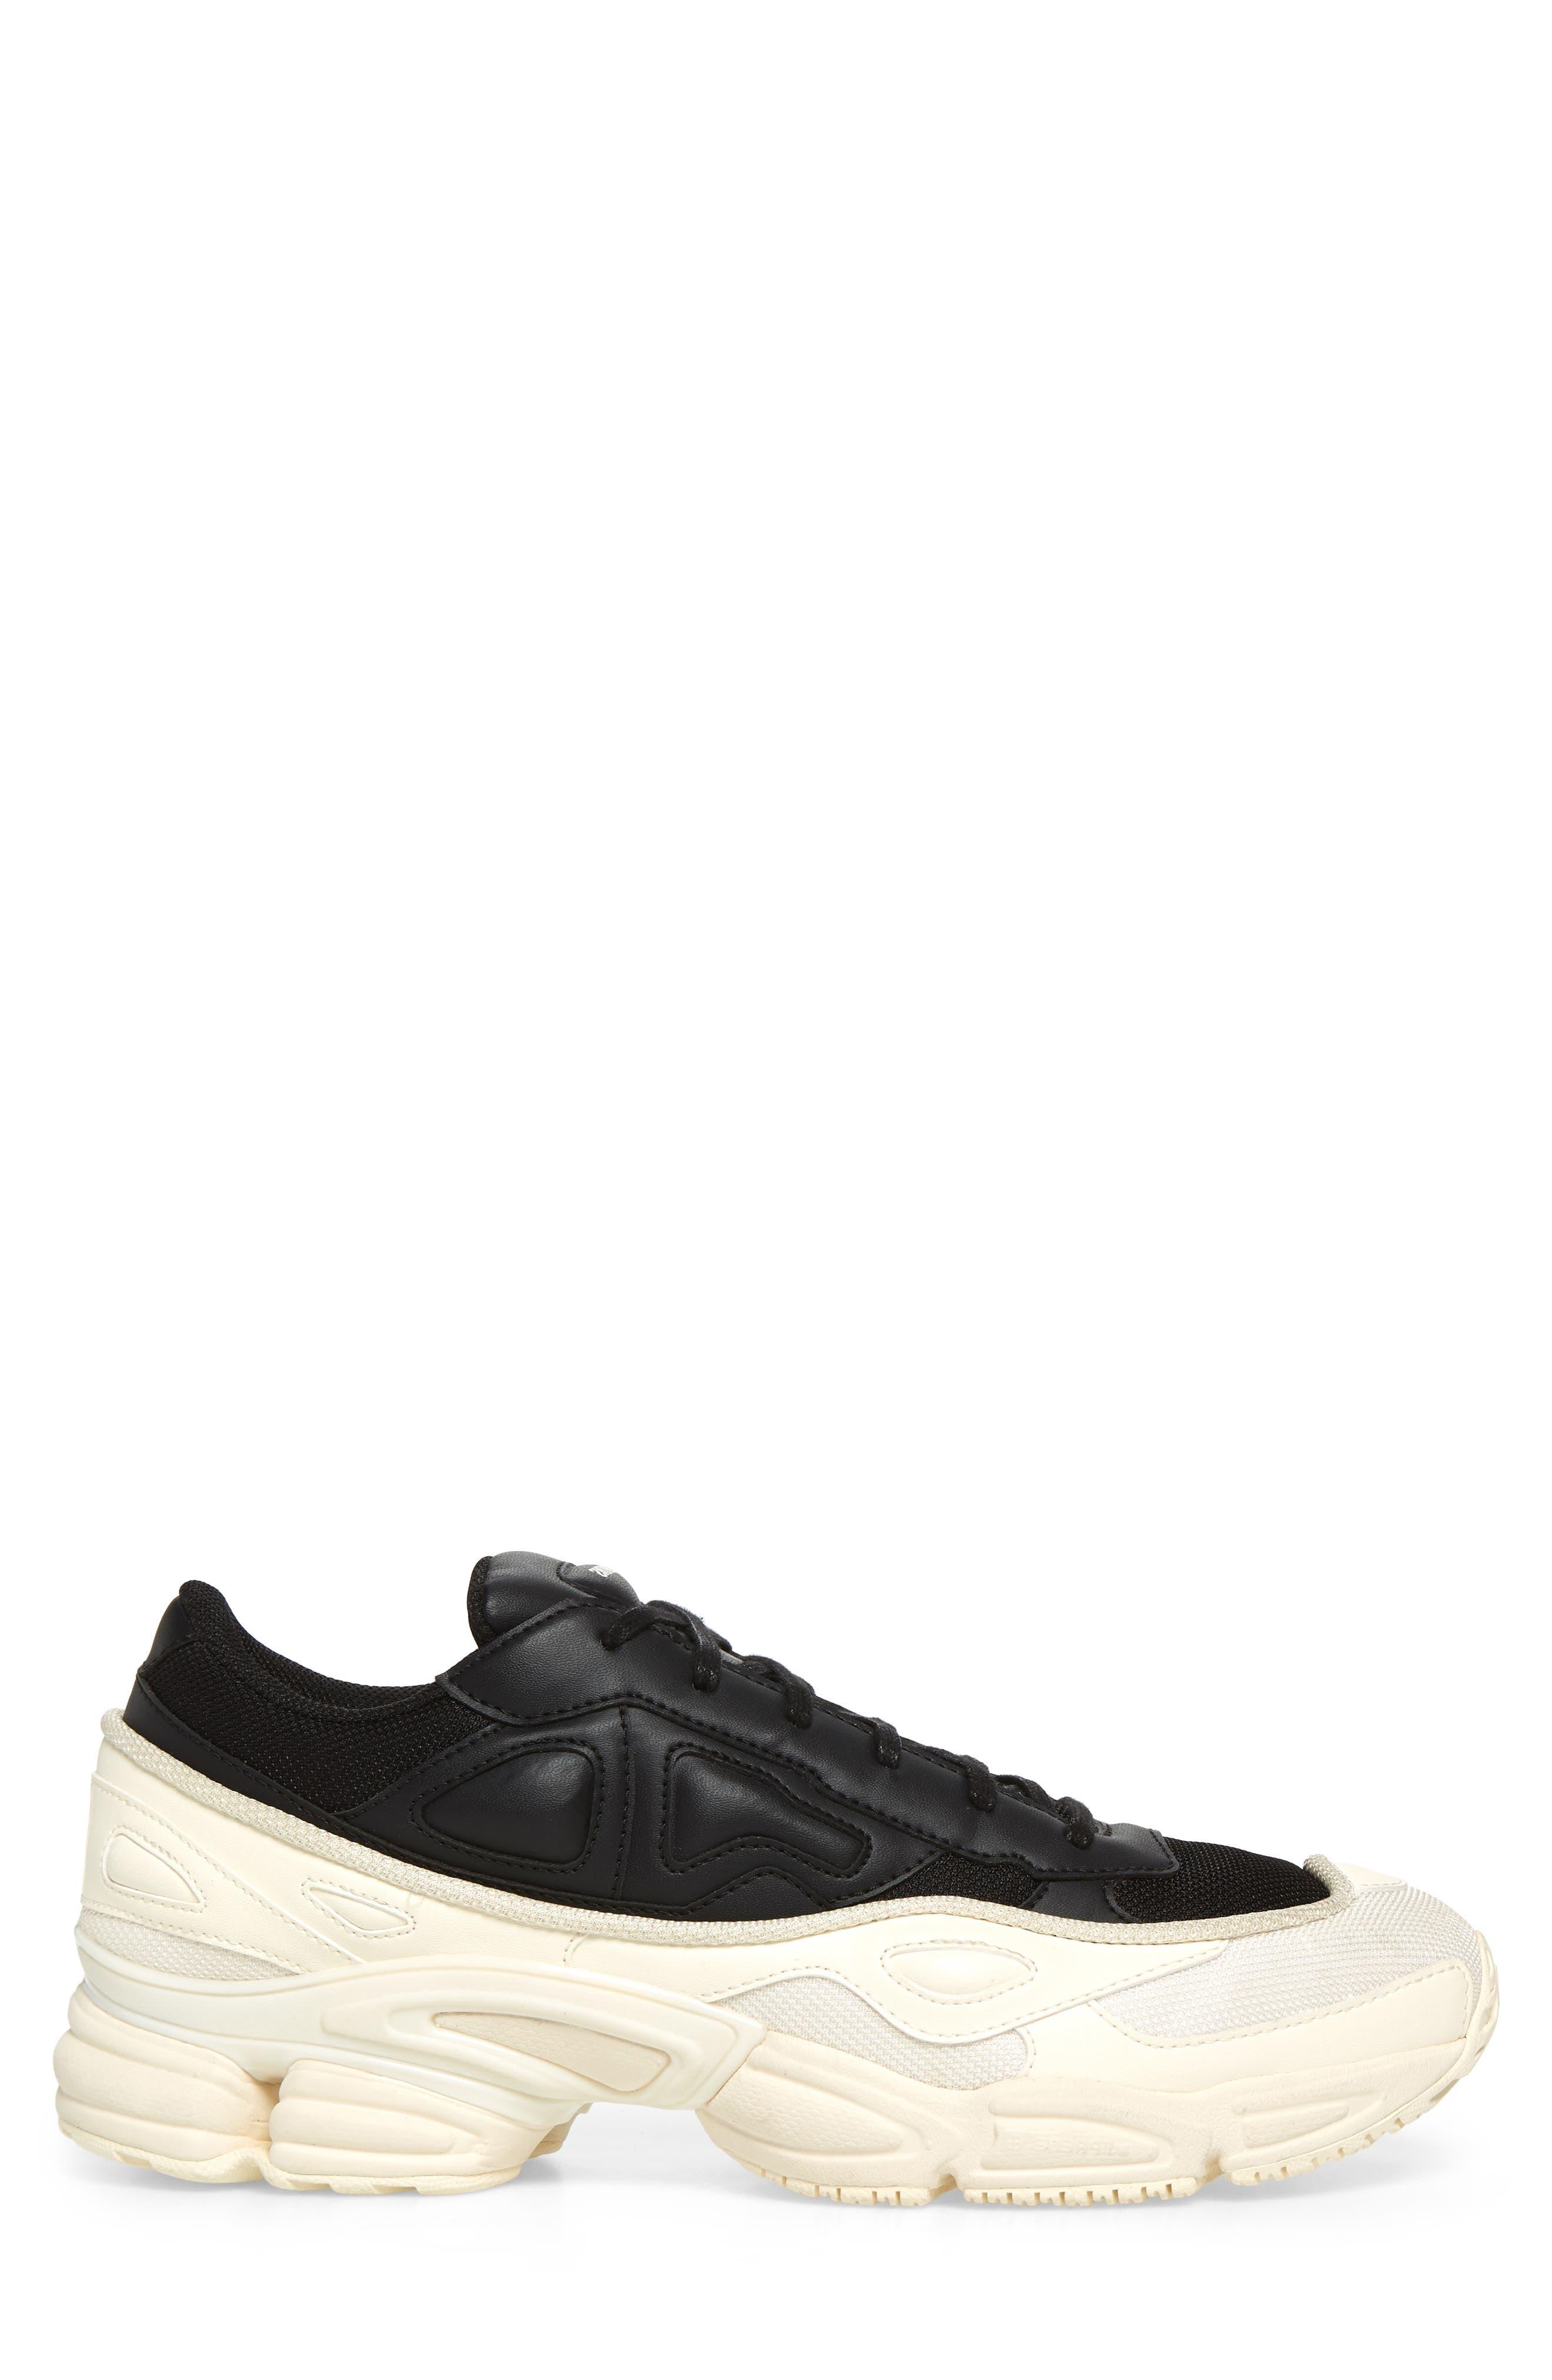 adidas by Raf Simons Ozweego III Sneaker,                             Alternate thumbnail 3, color,                             CREAM WHITE/ CORE BLACK